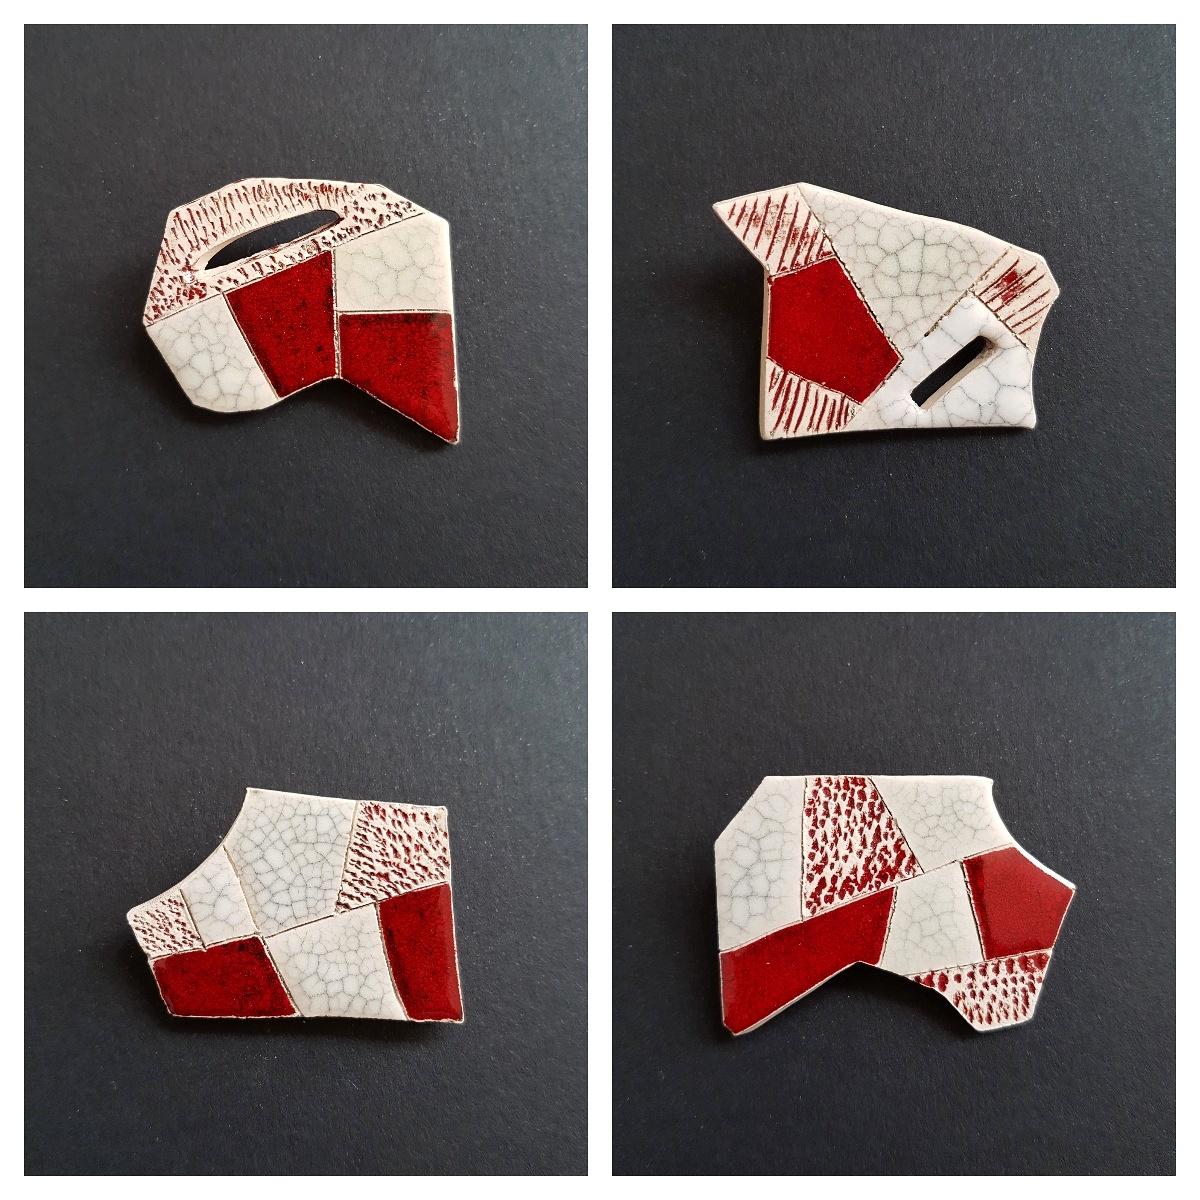 Mondrian-1505426549.jpg